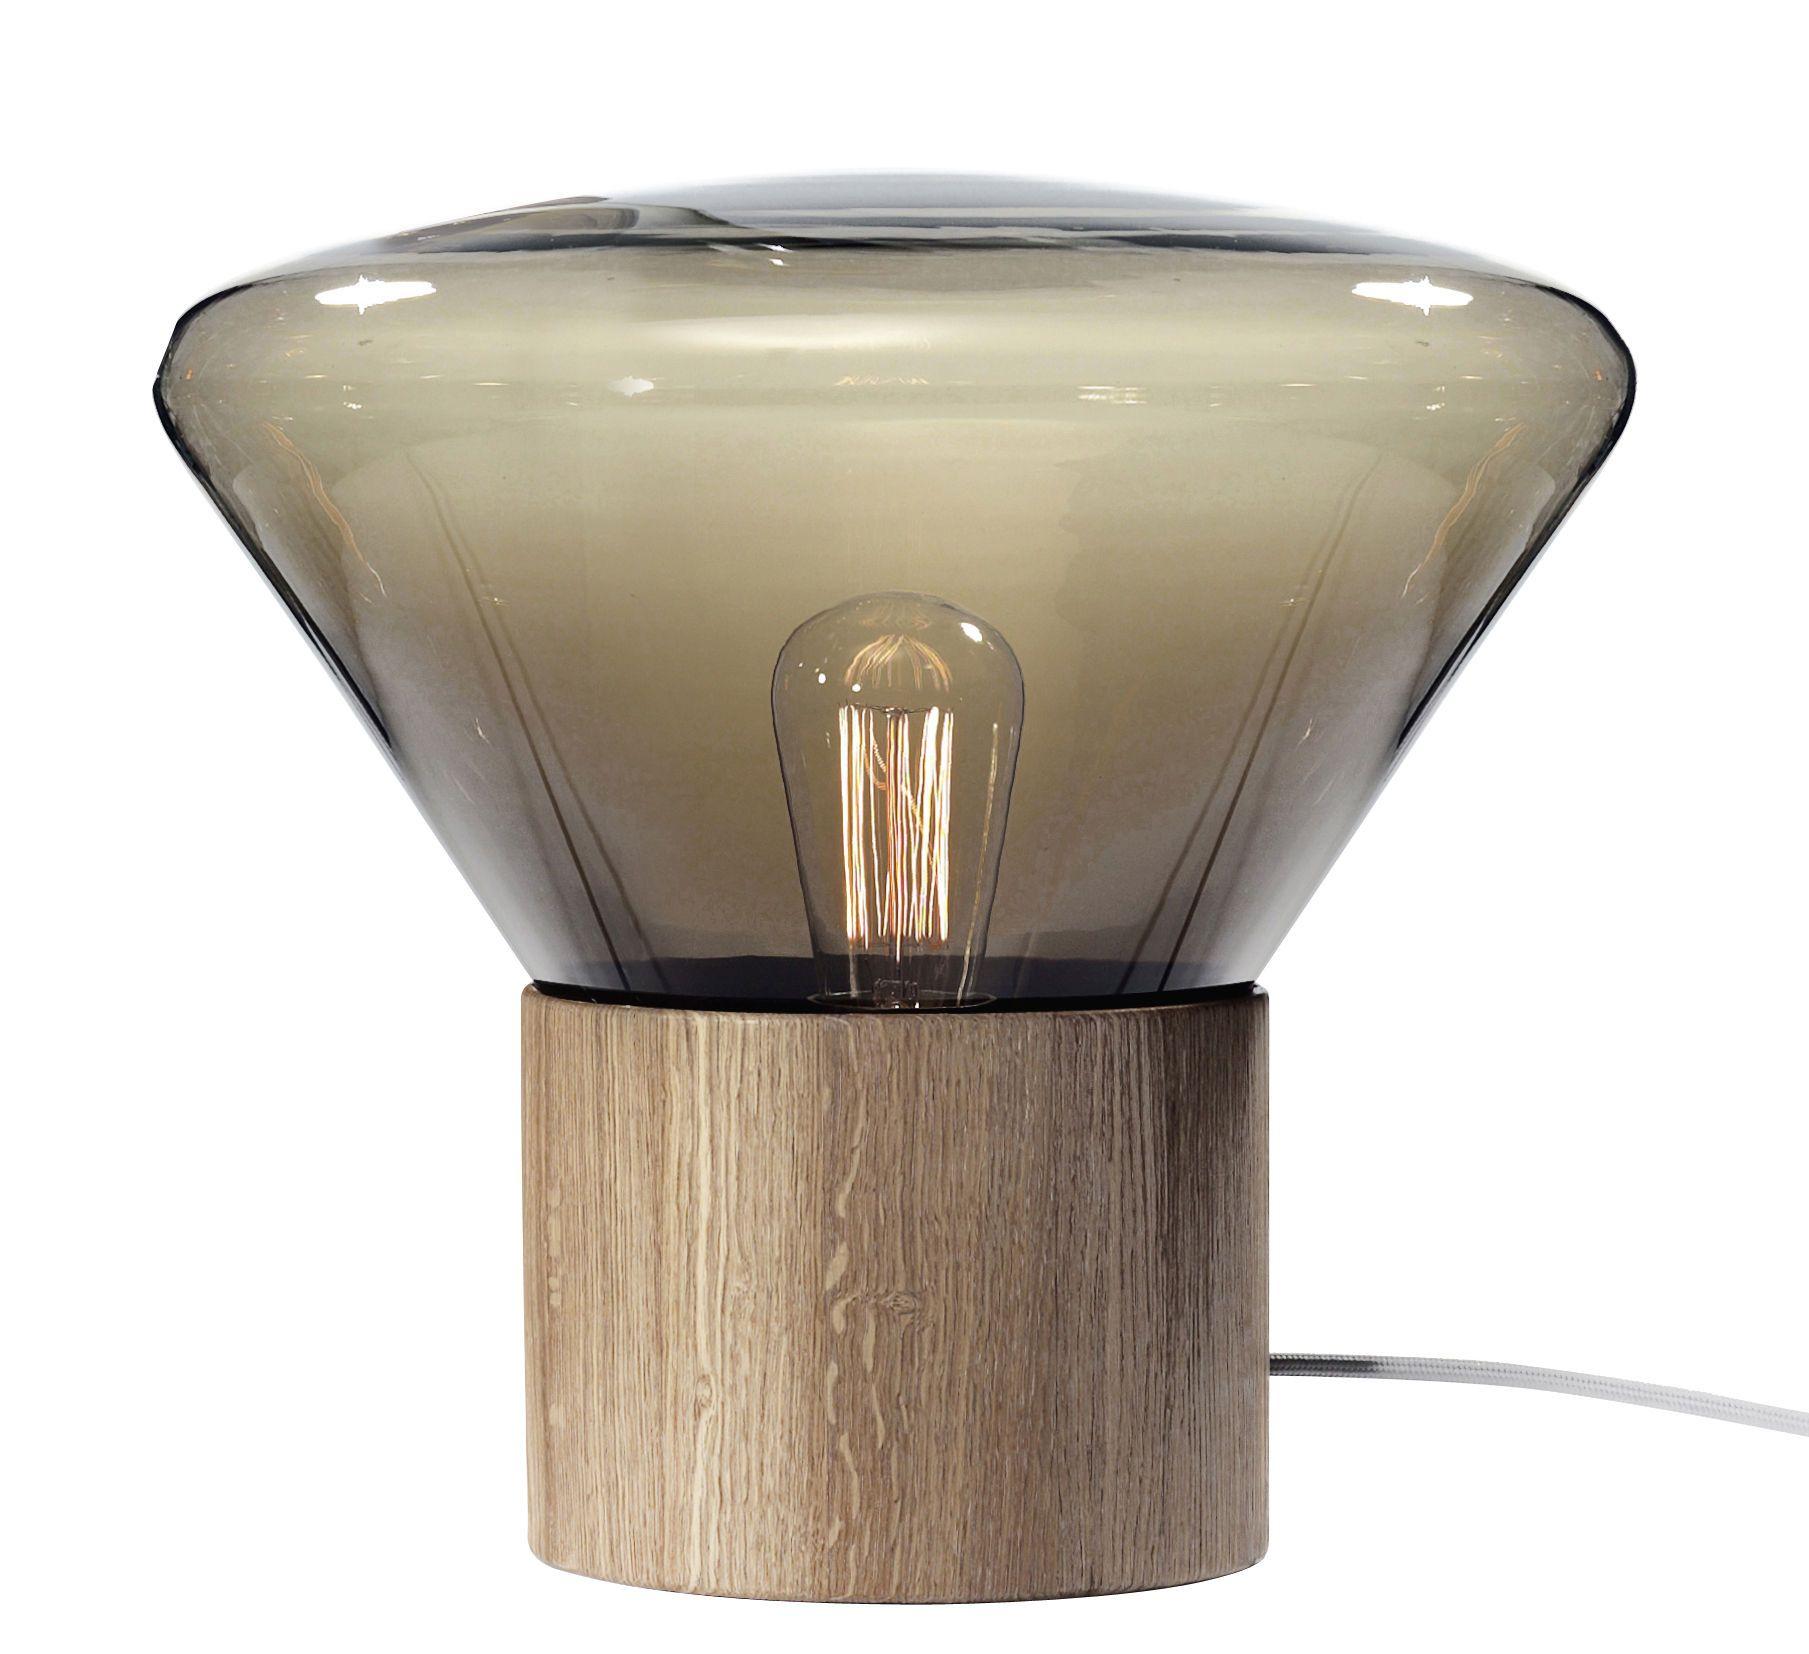 Luminaire Lampes De Table Lampe De Table Medium H 34 Cm Brokis Verre Marron Fume Chene Verre Souffle Lampes De Table Lamp Lampes Modernes